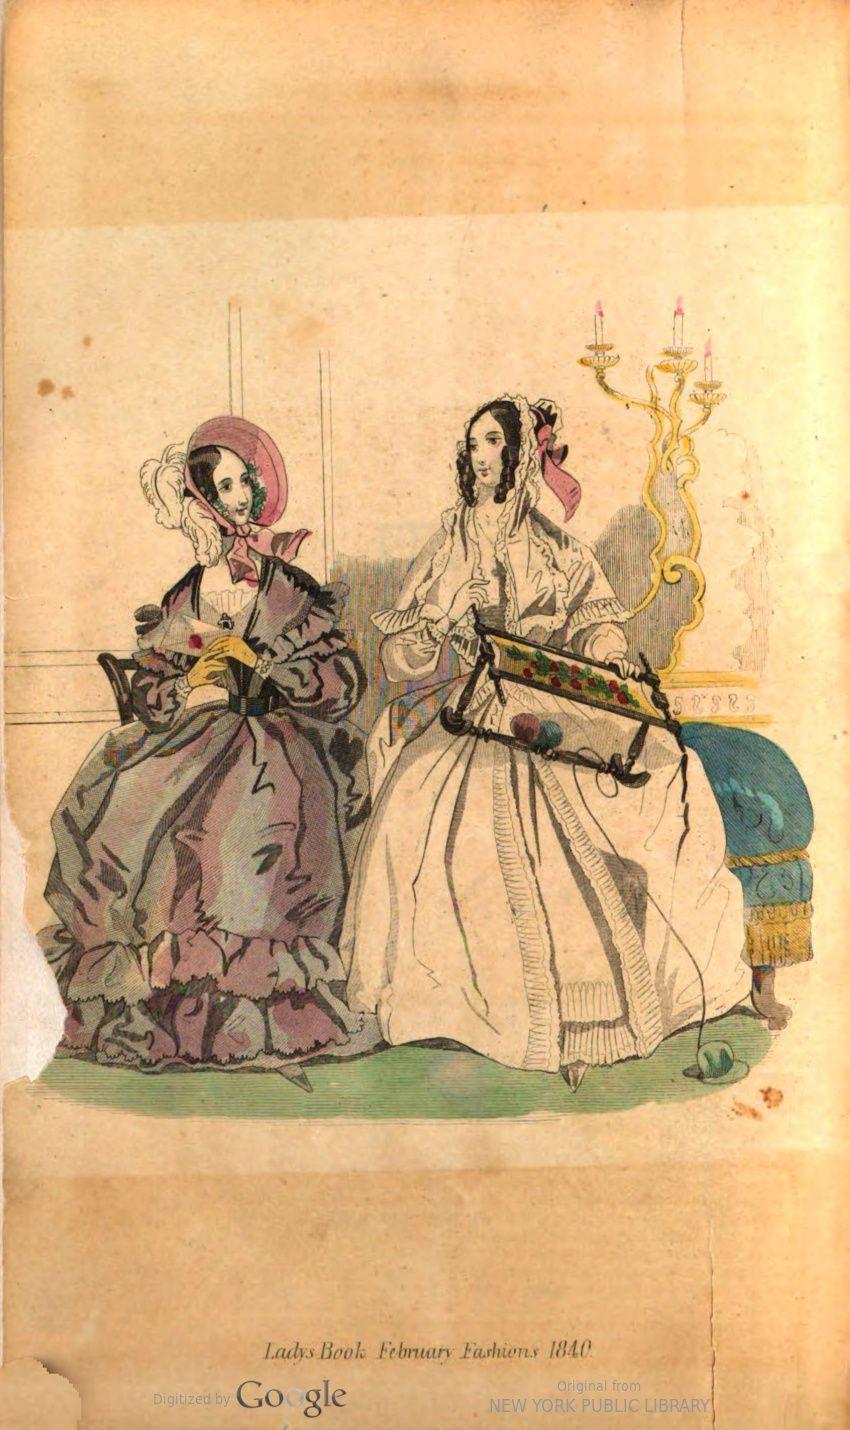 February godeys ladys book fashion plate 1840 fashion